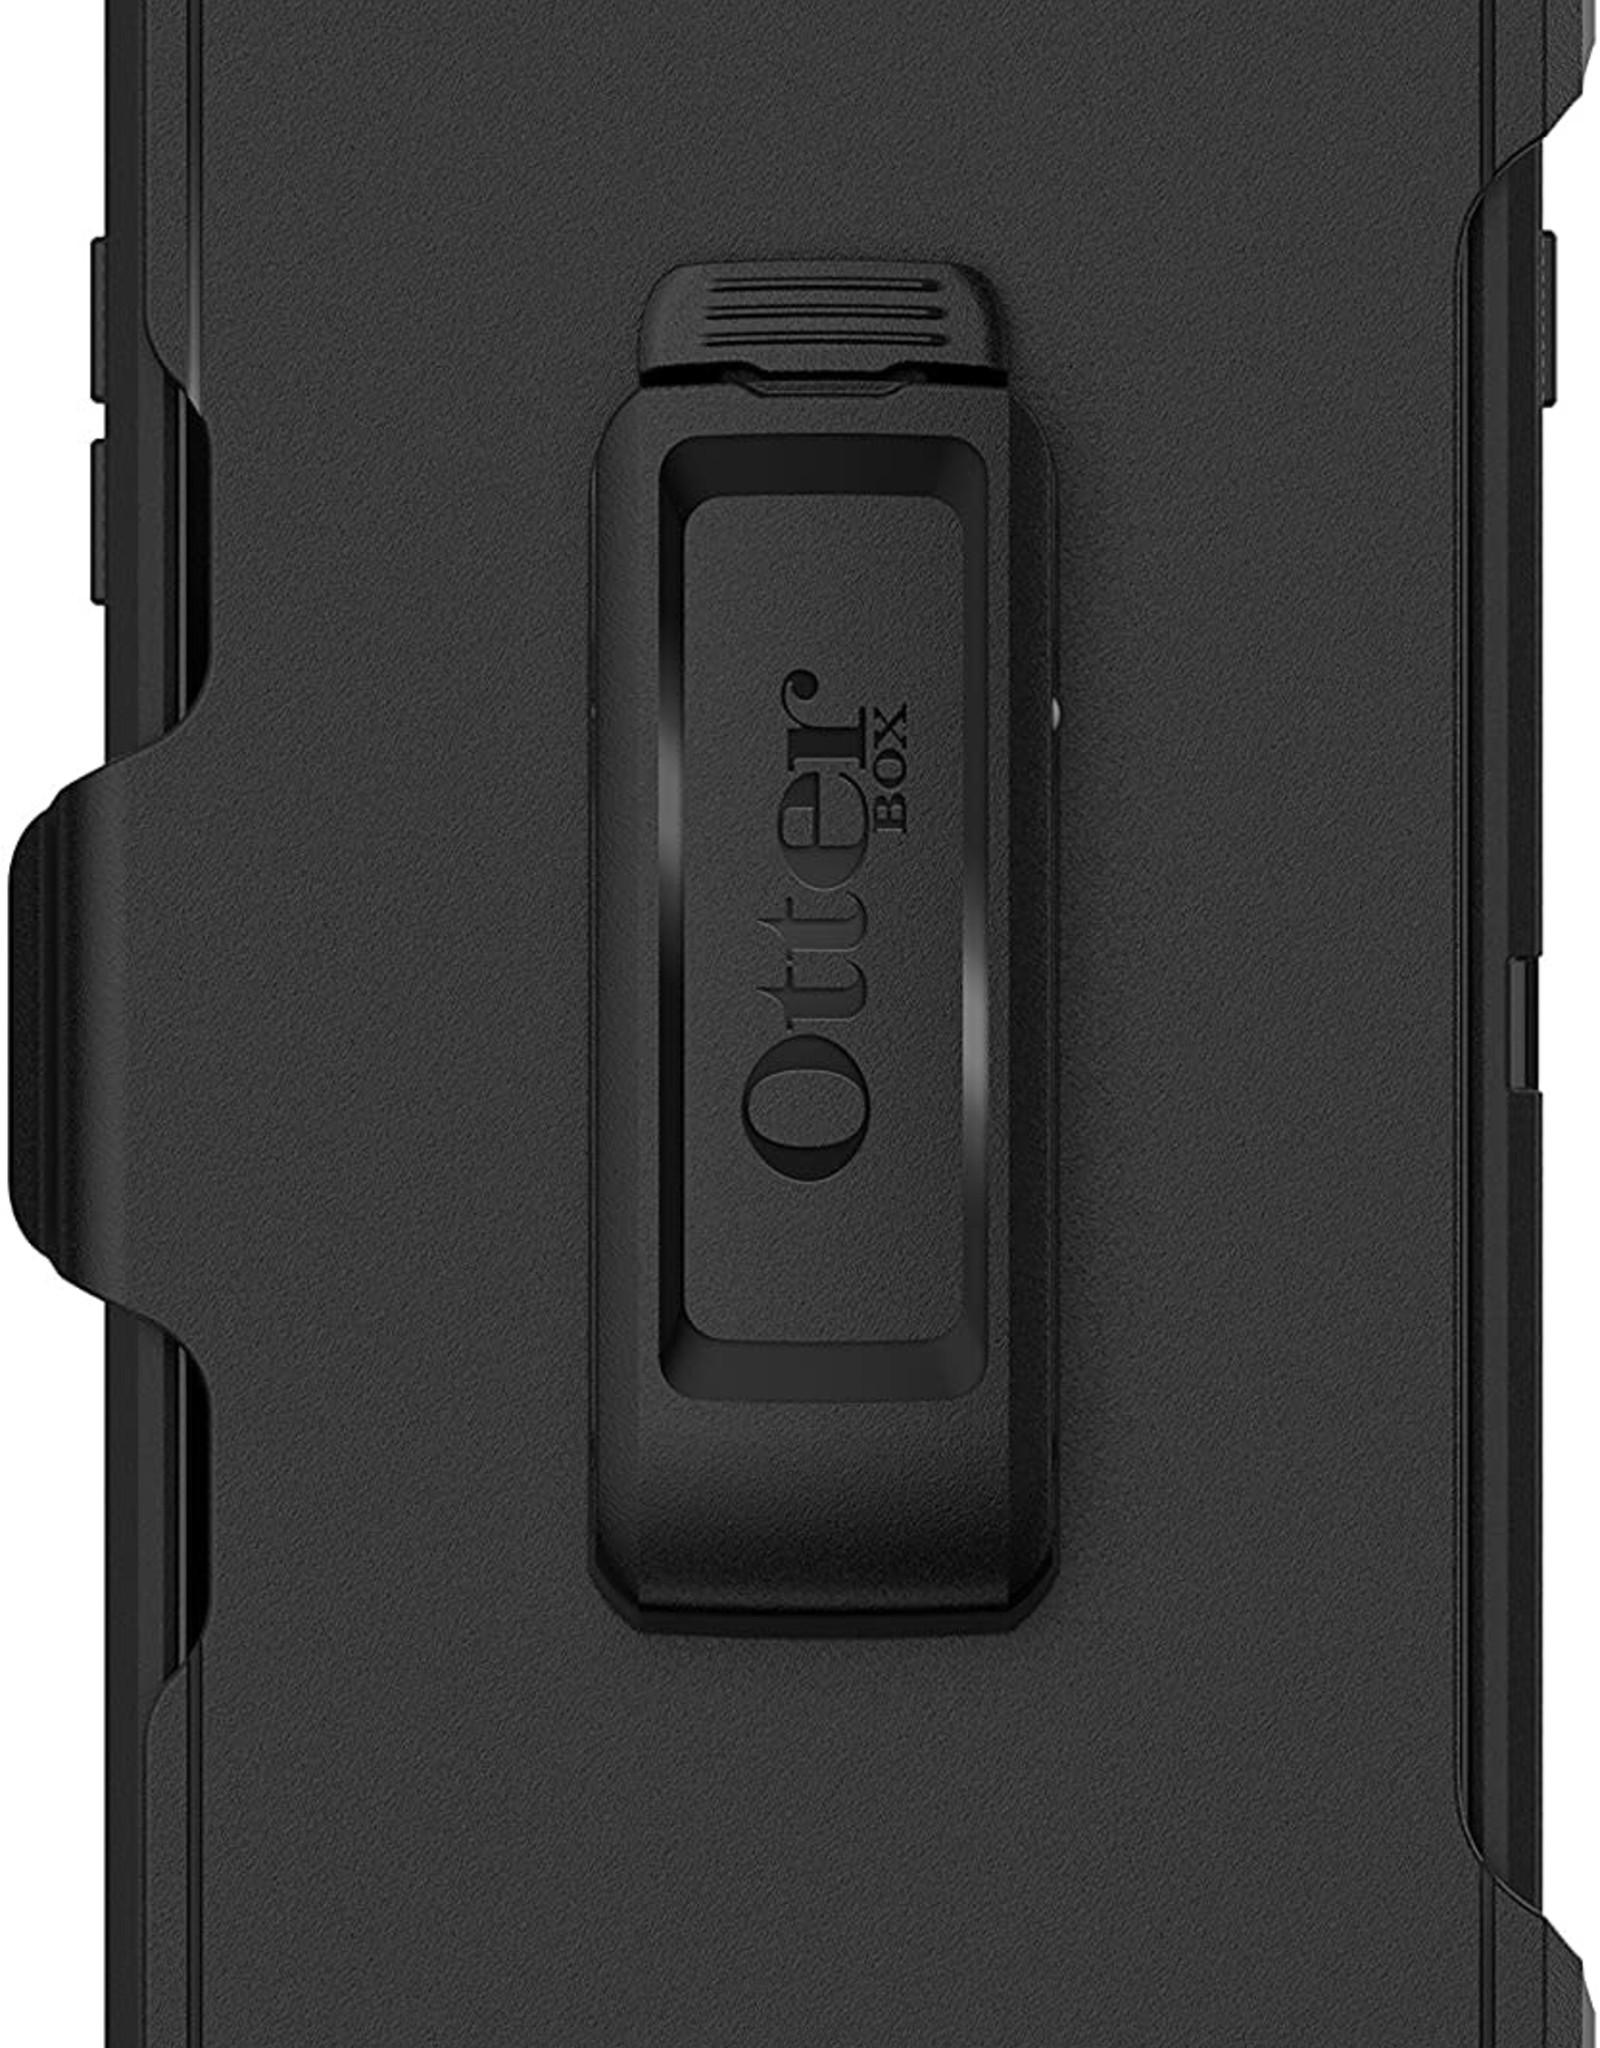 Otter Box Otterbox Defender Series Case for iPhone 8 Plus & iPhone 7 Plus  8 Plus - Black